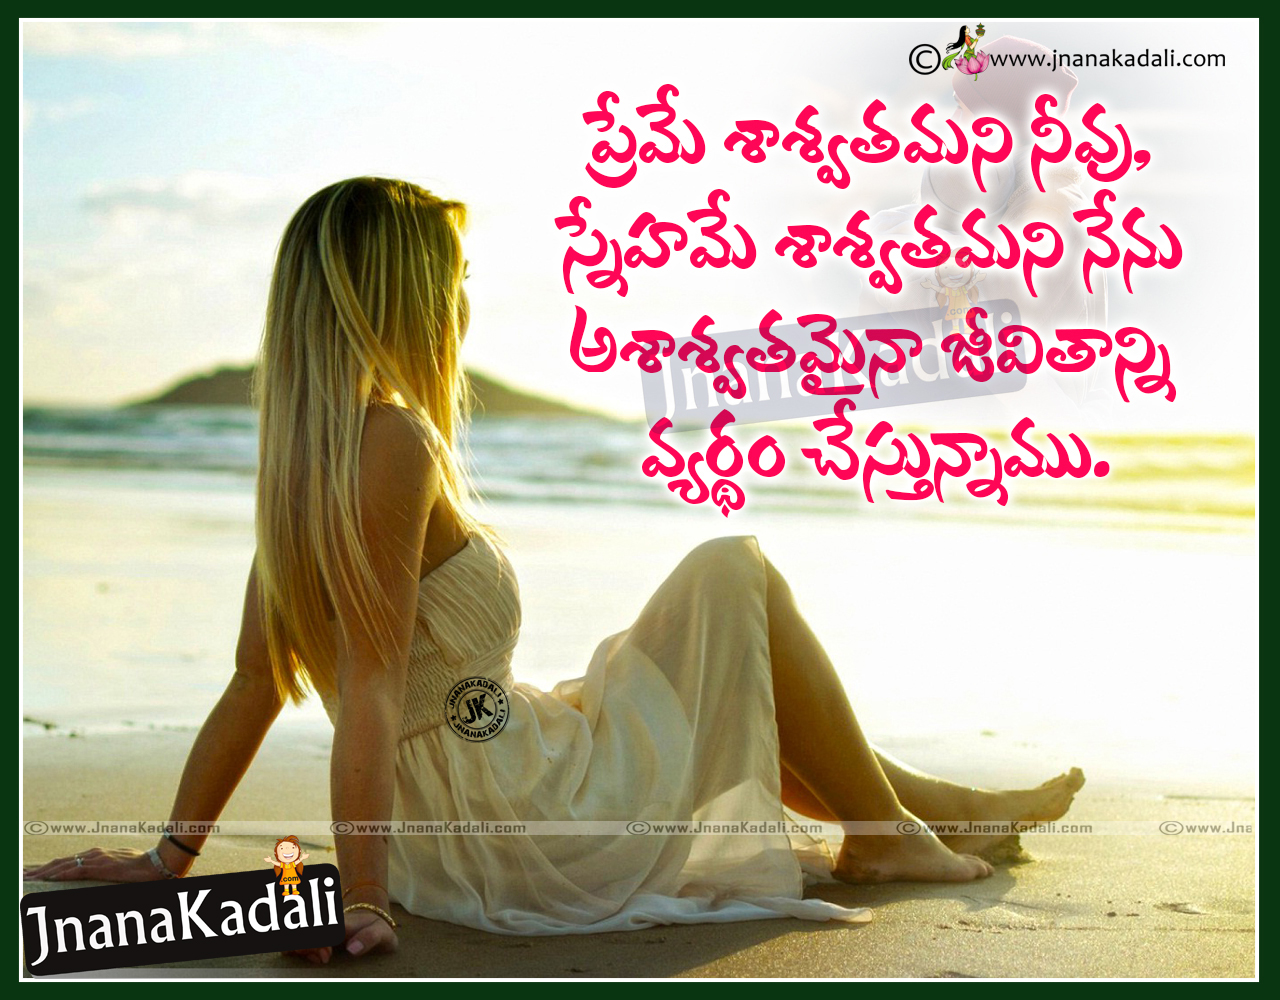 Best Telugu Manchi Matalu Inspirational Quotations Jnana